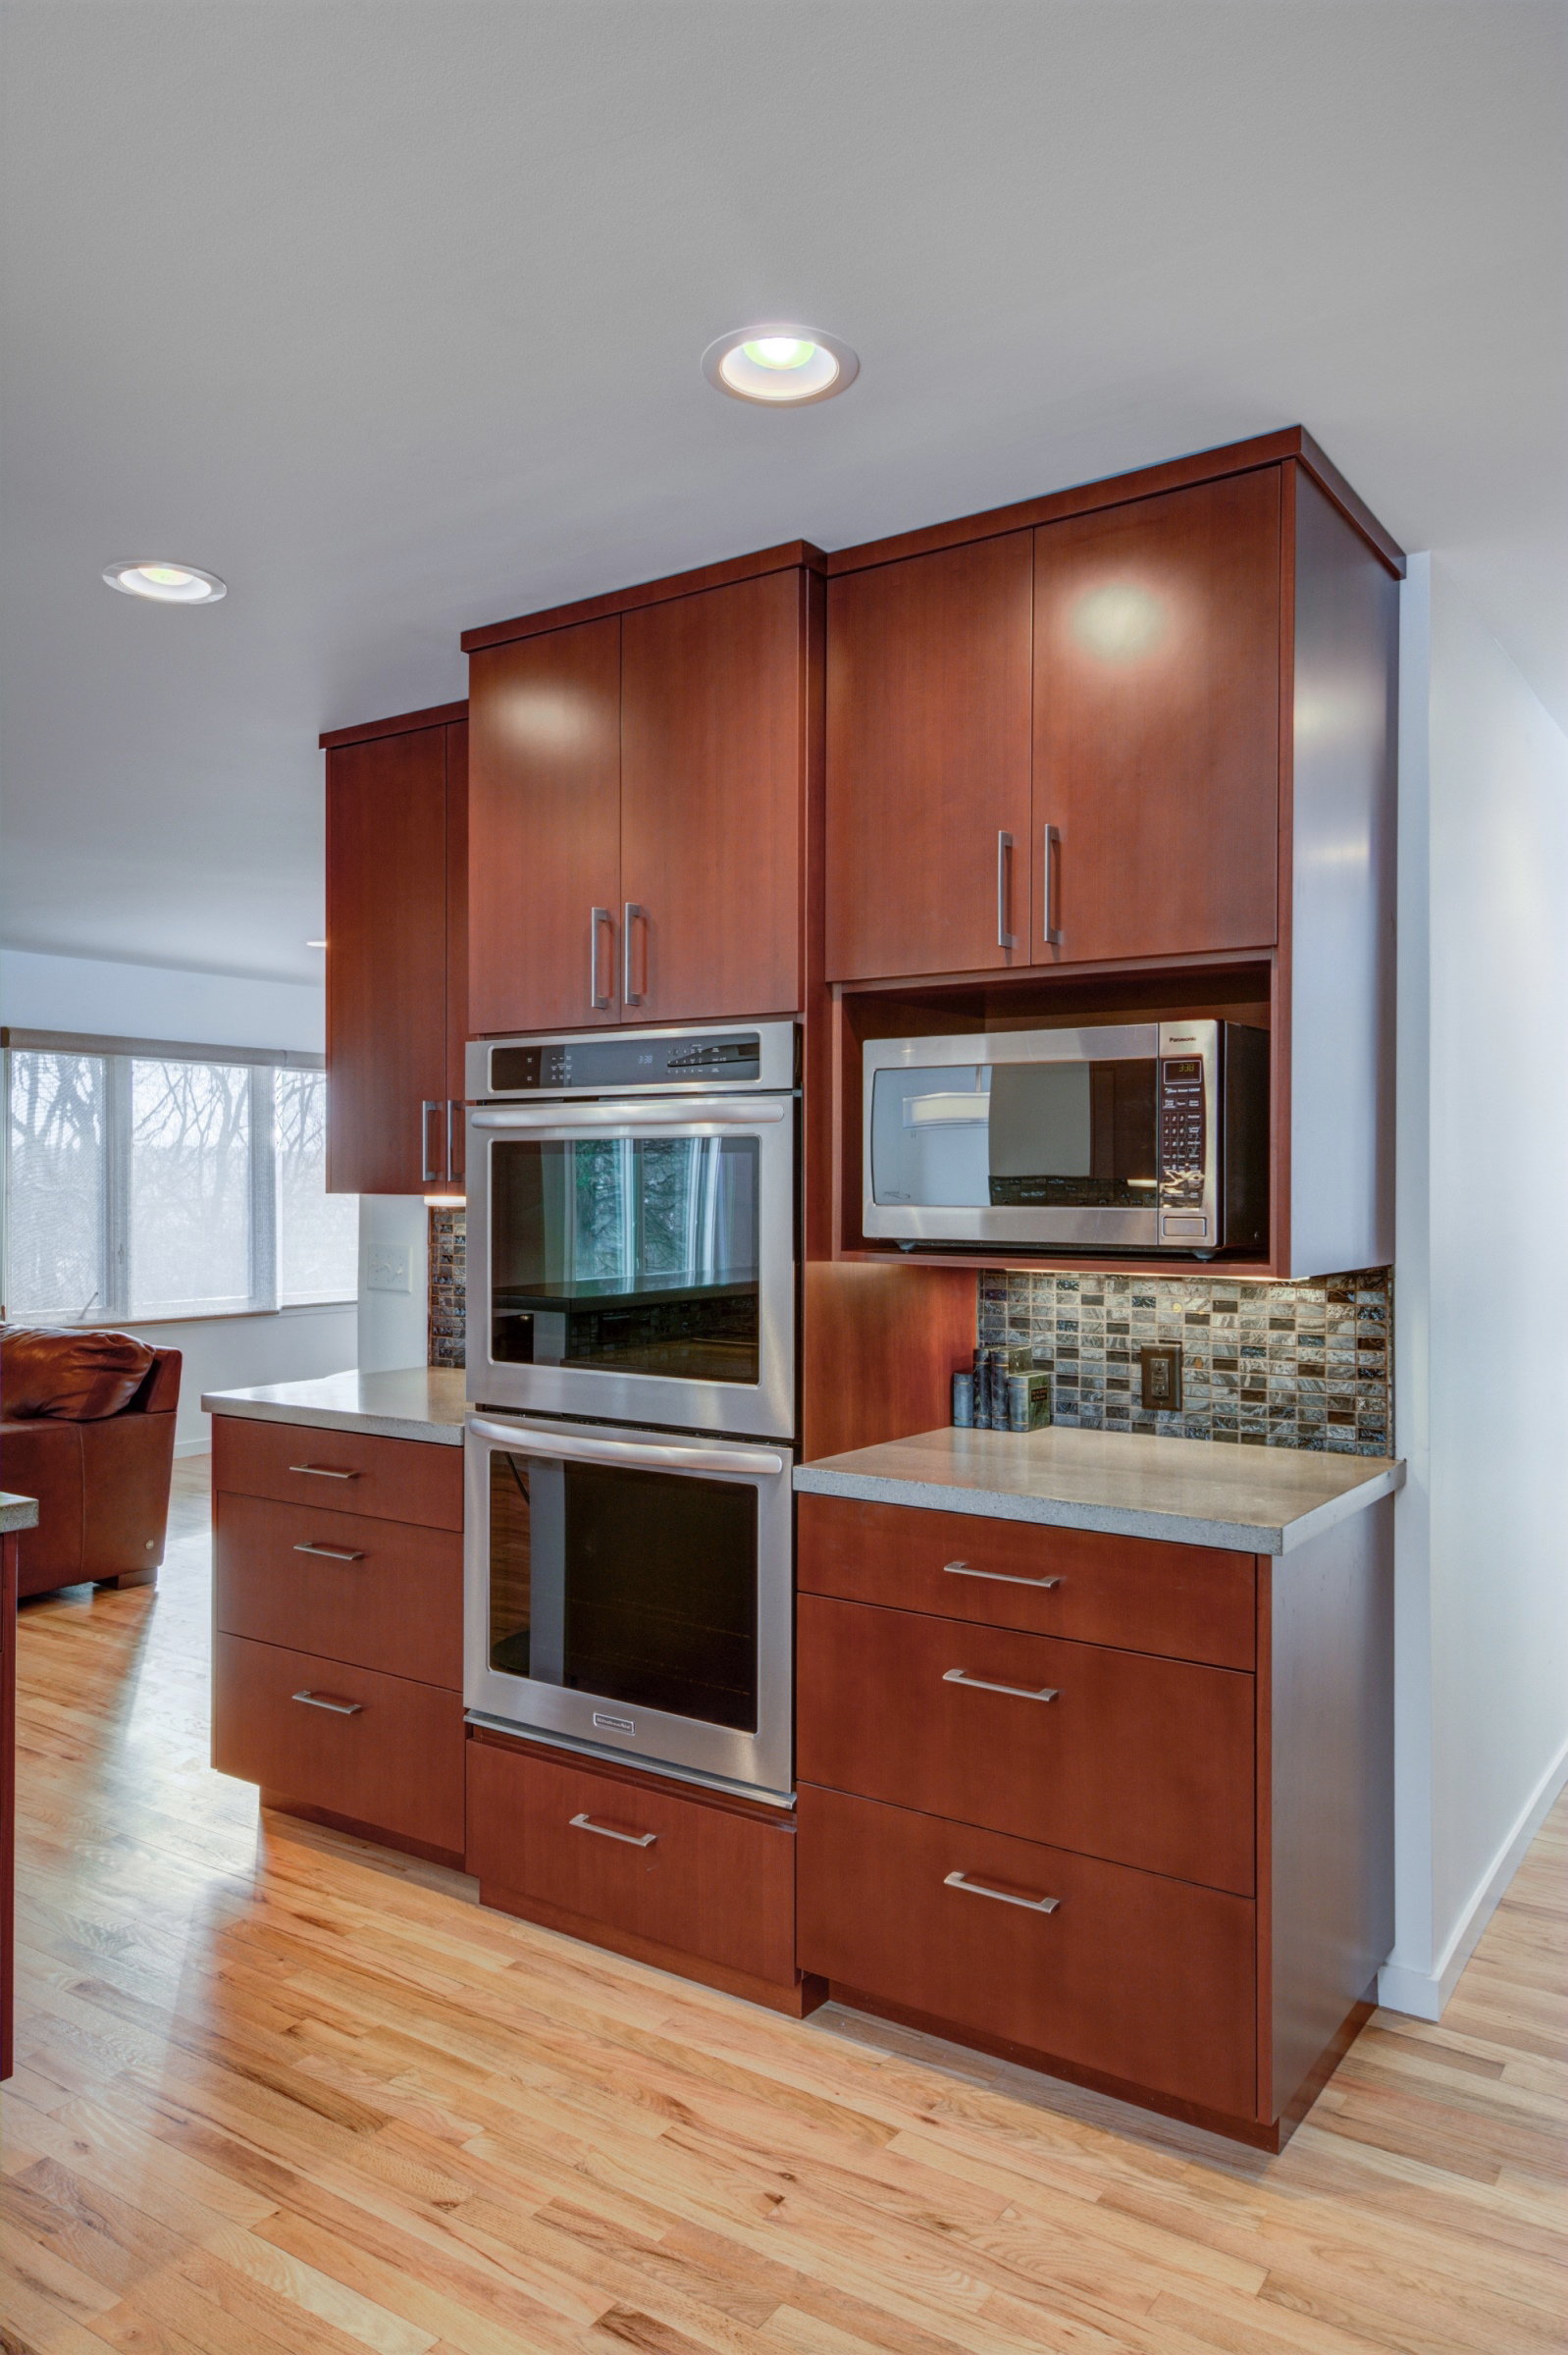 Kitchens_32.jpg